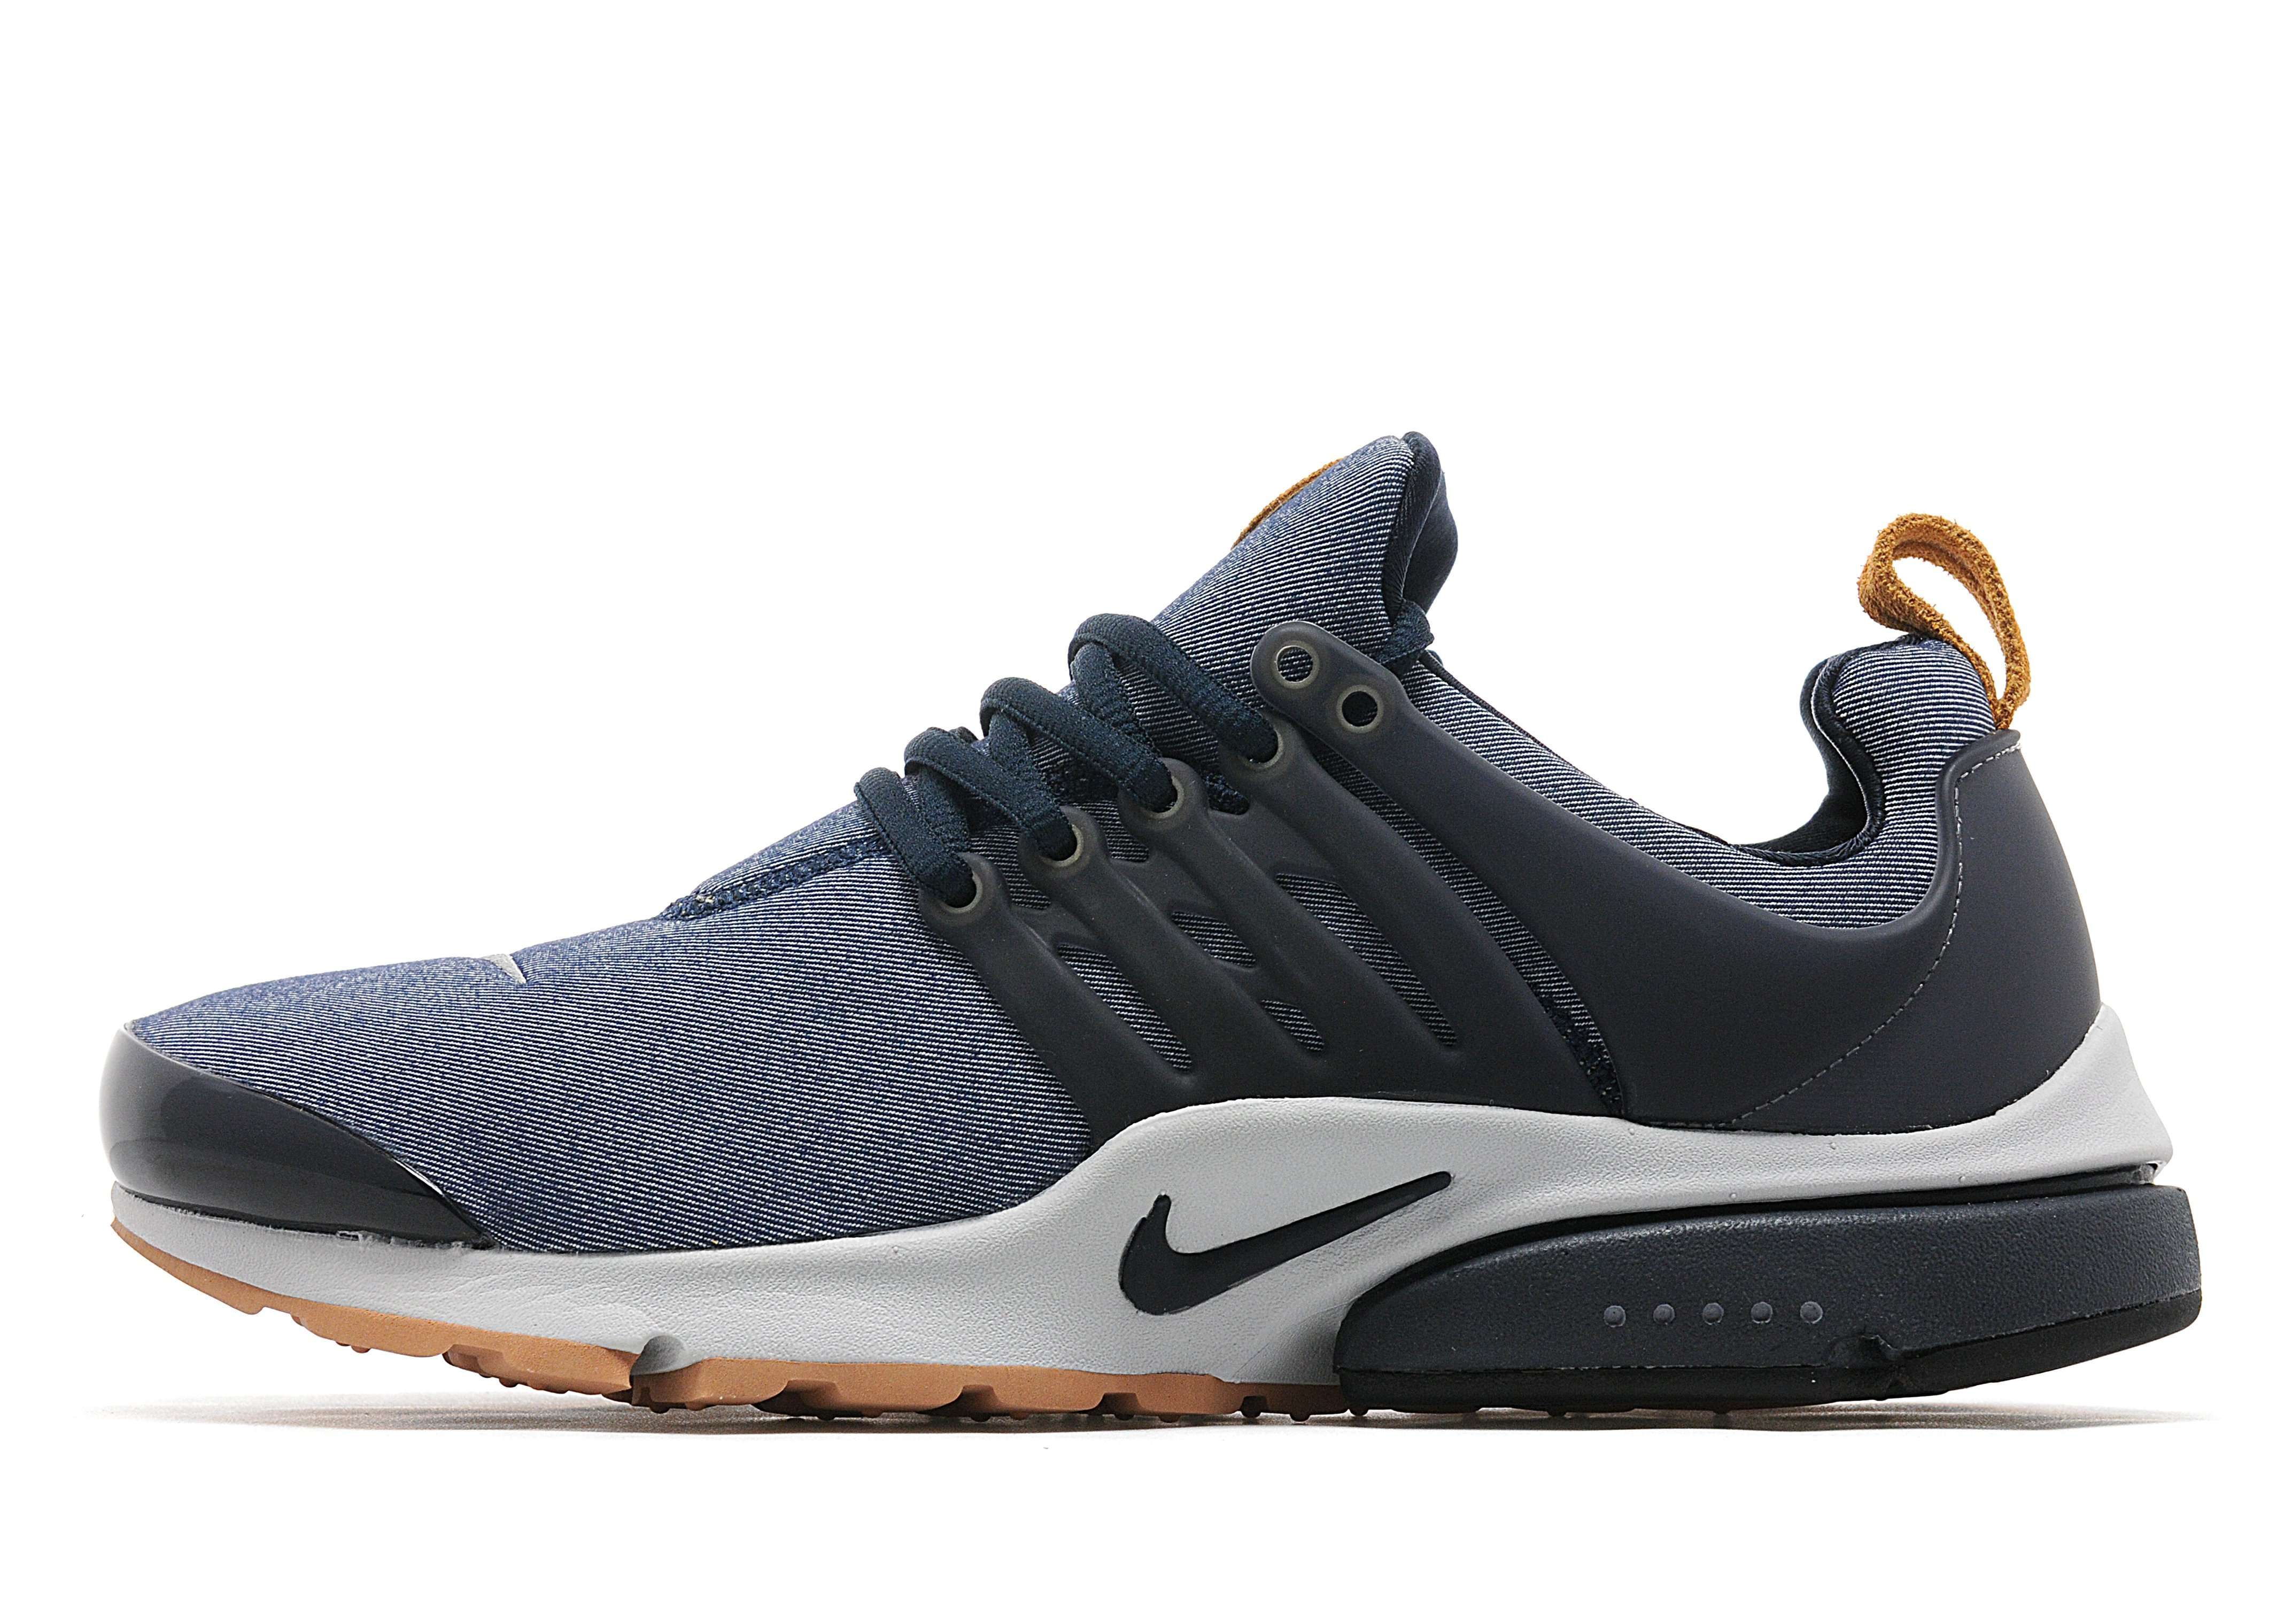 Nike Air Presto Premium Men's Shoe